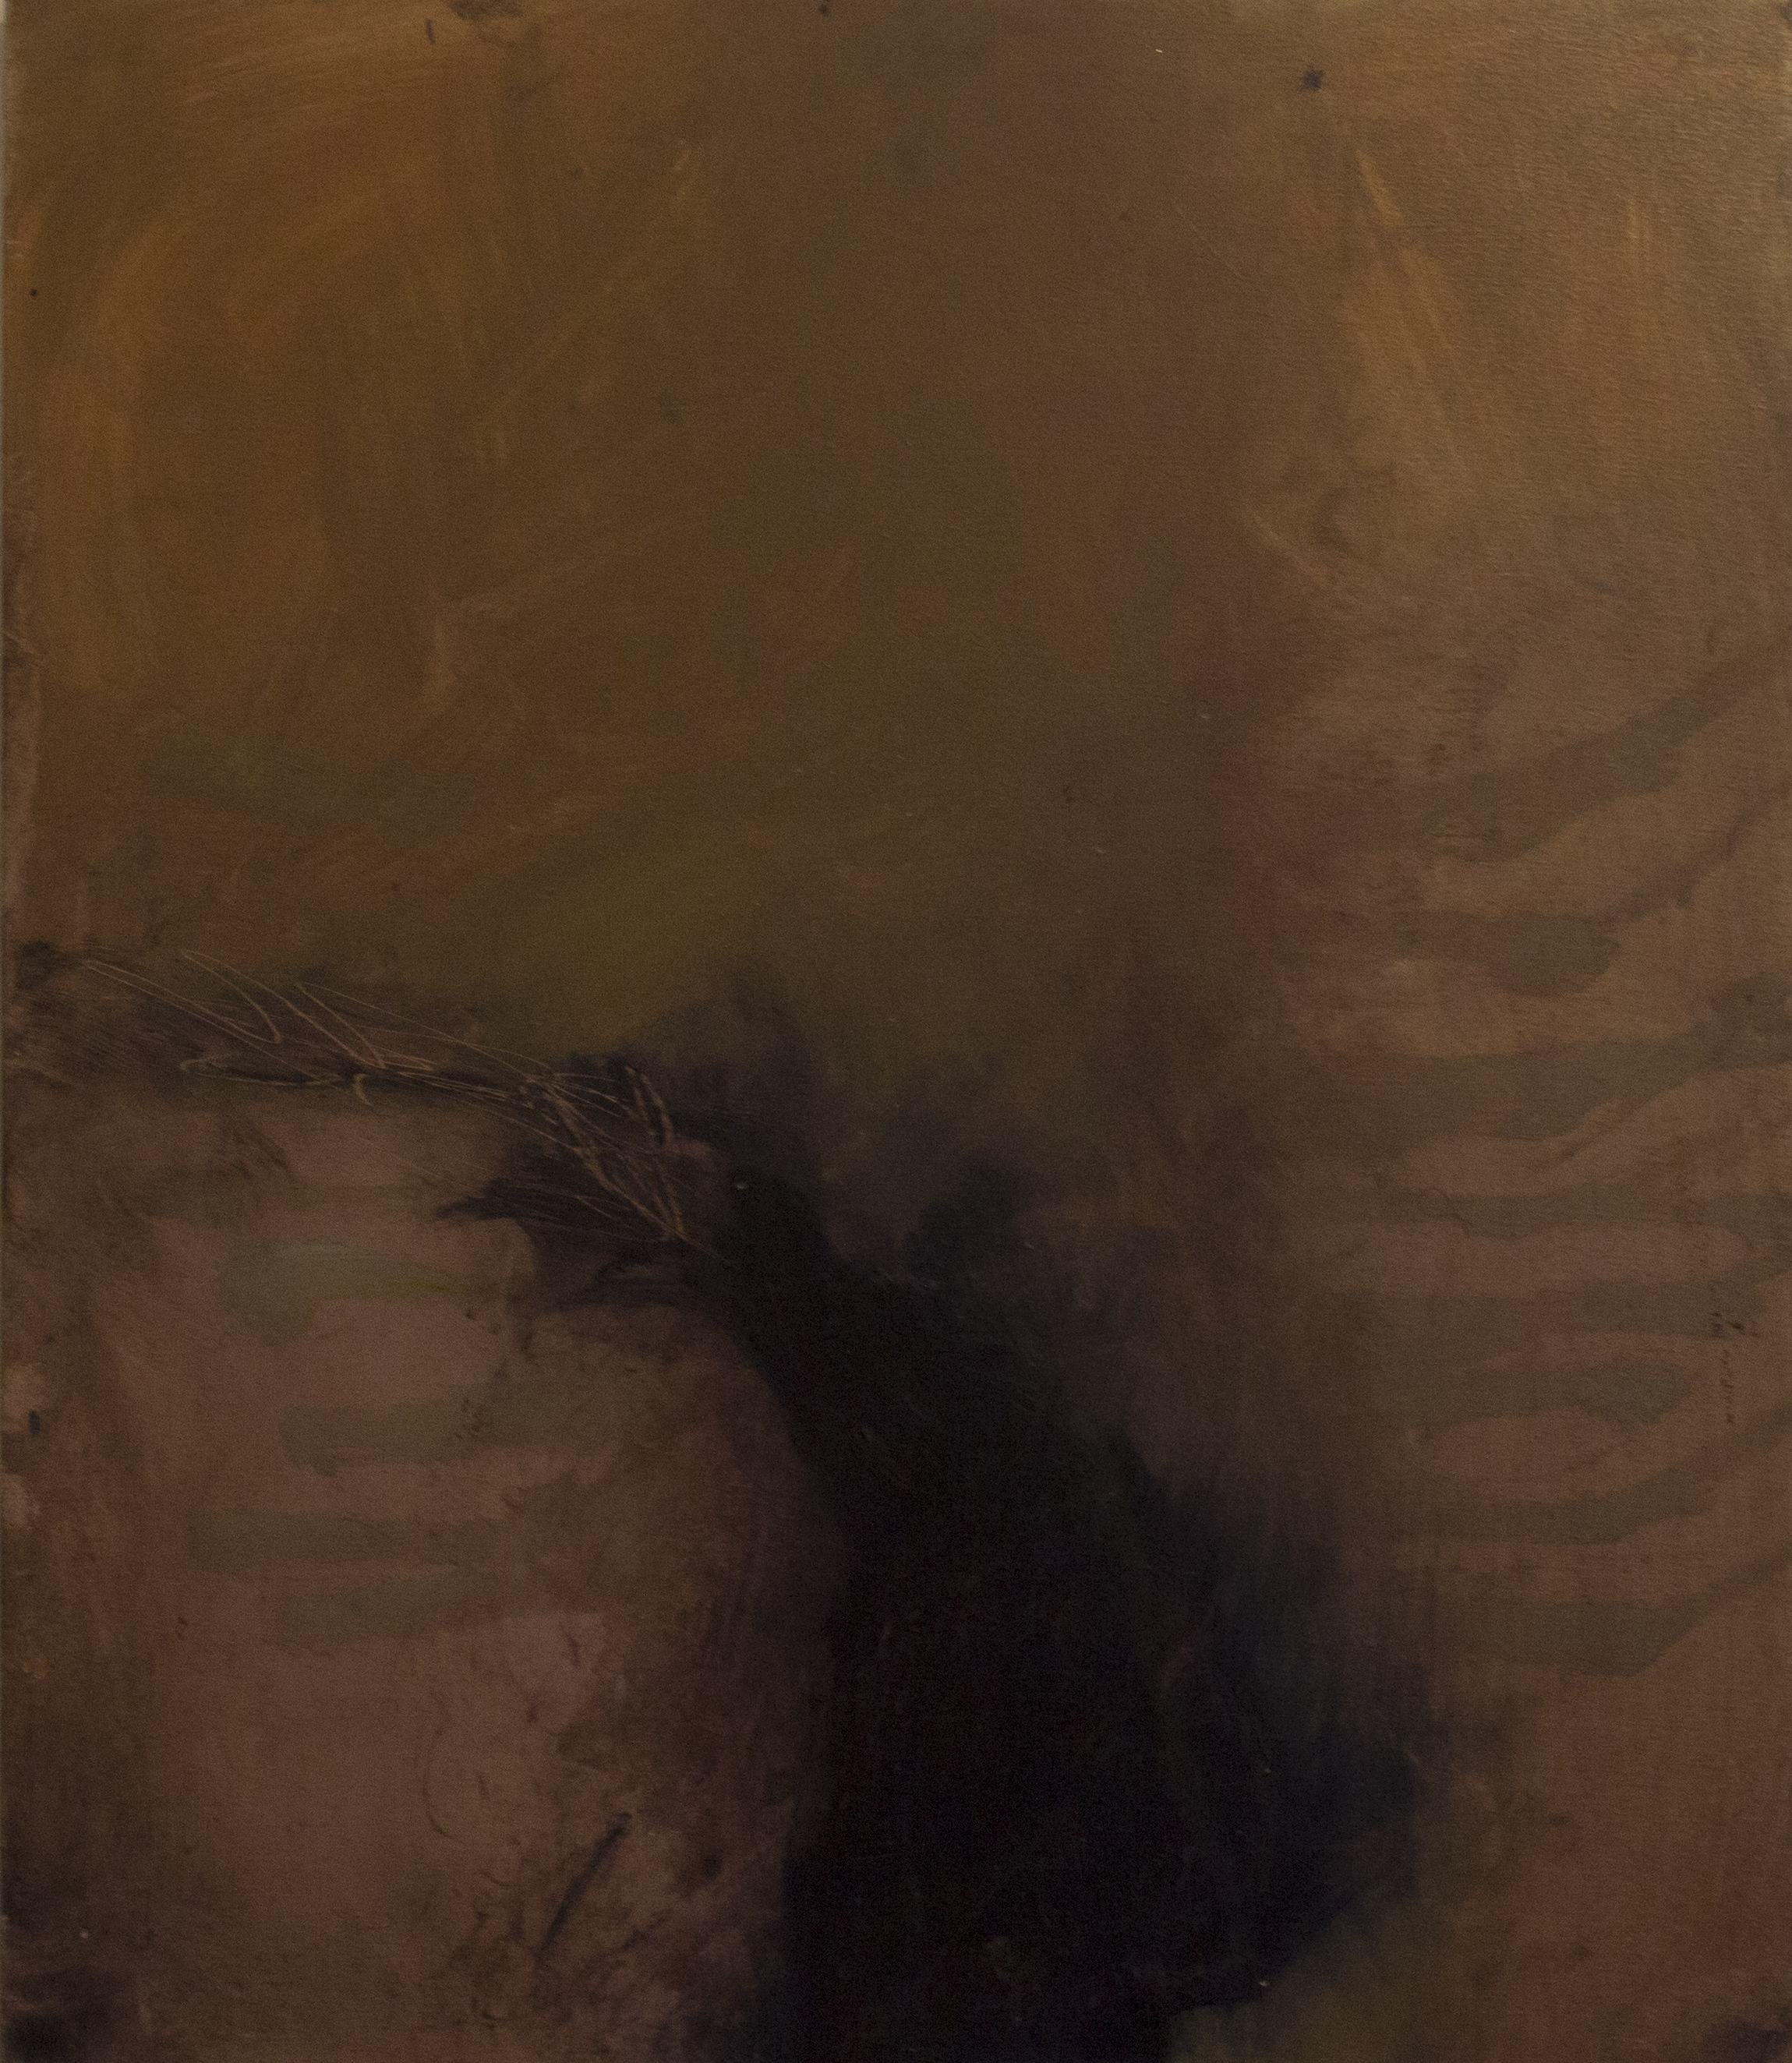 Jules Allan - A vestige 1, 70cm x 60cm, oil on canvas